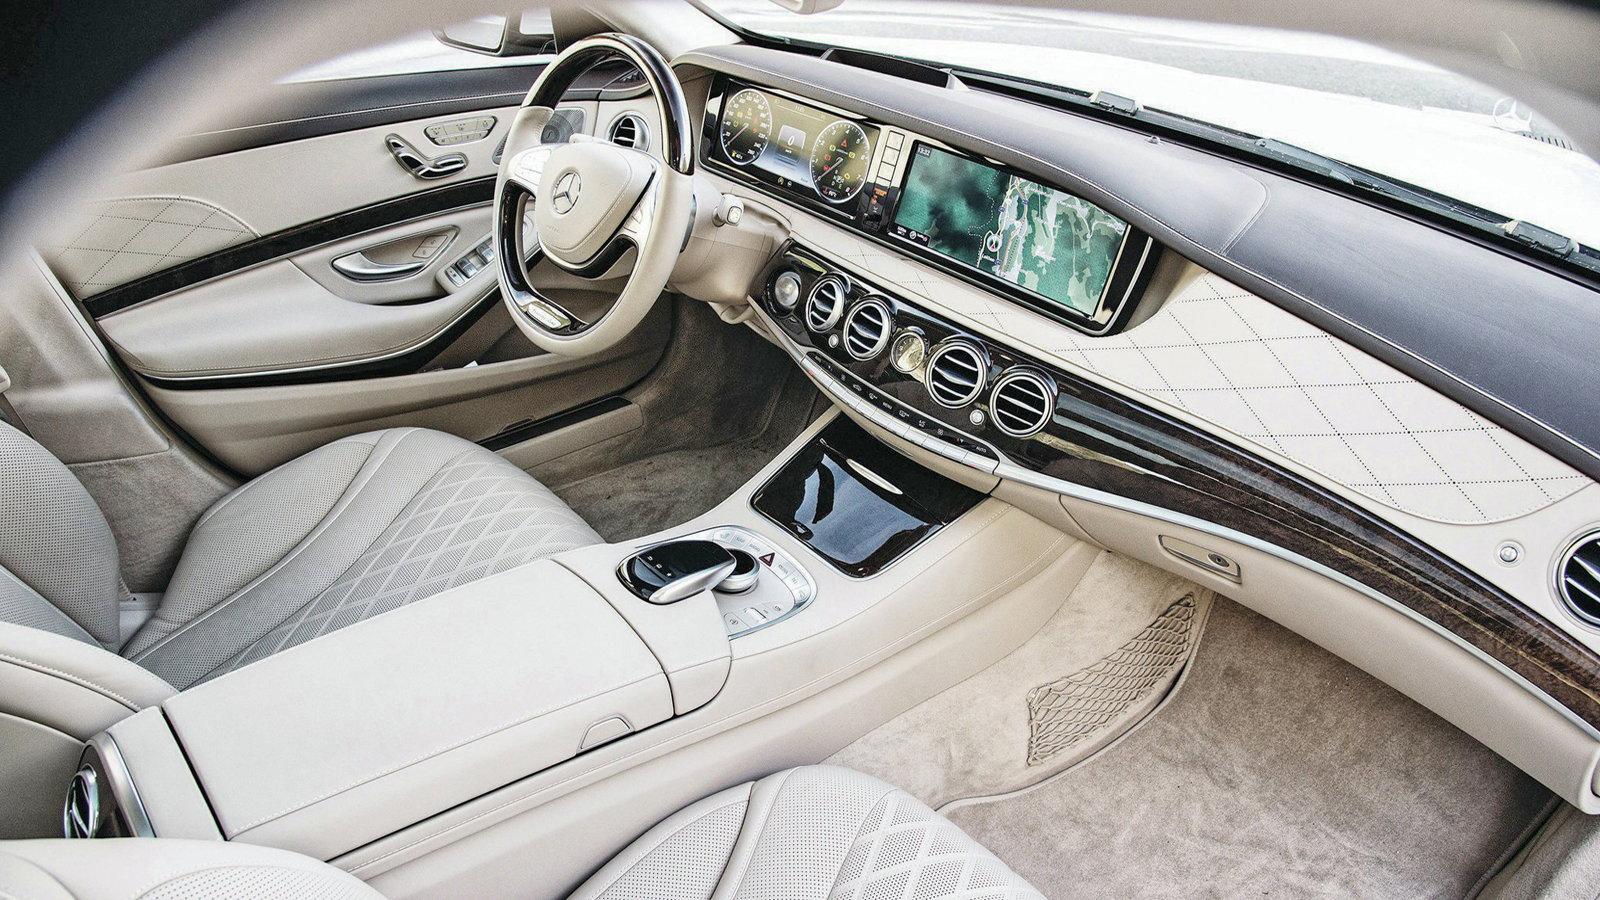 6 Pics of MBs Mega Opulent S600 Royale